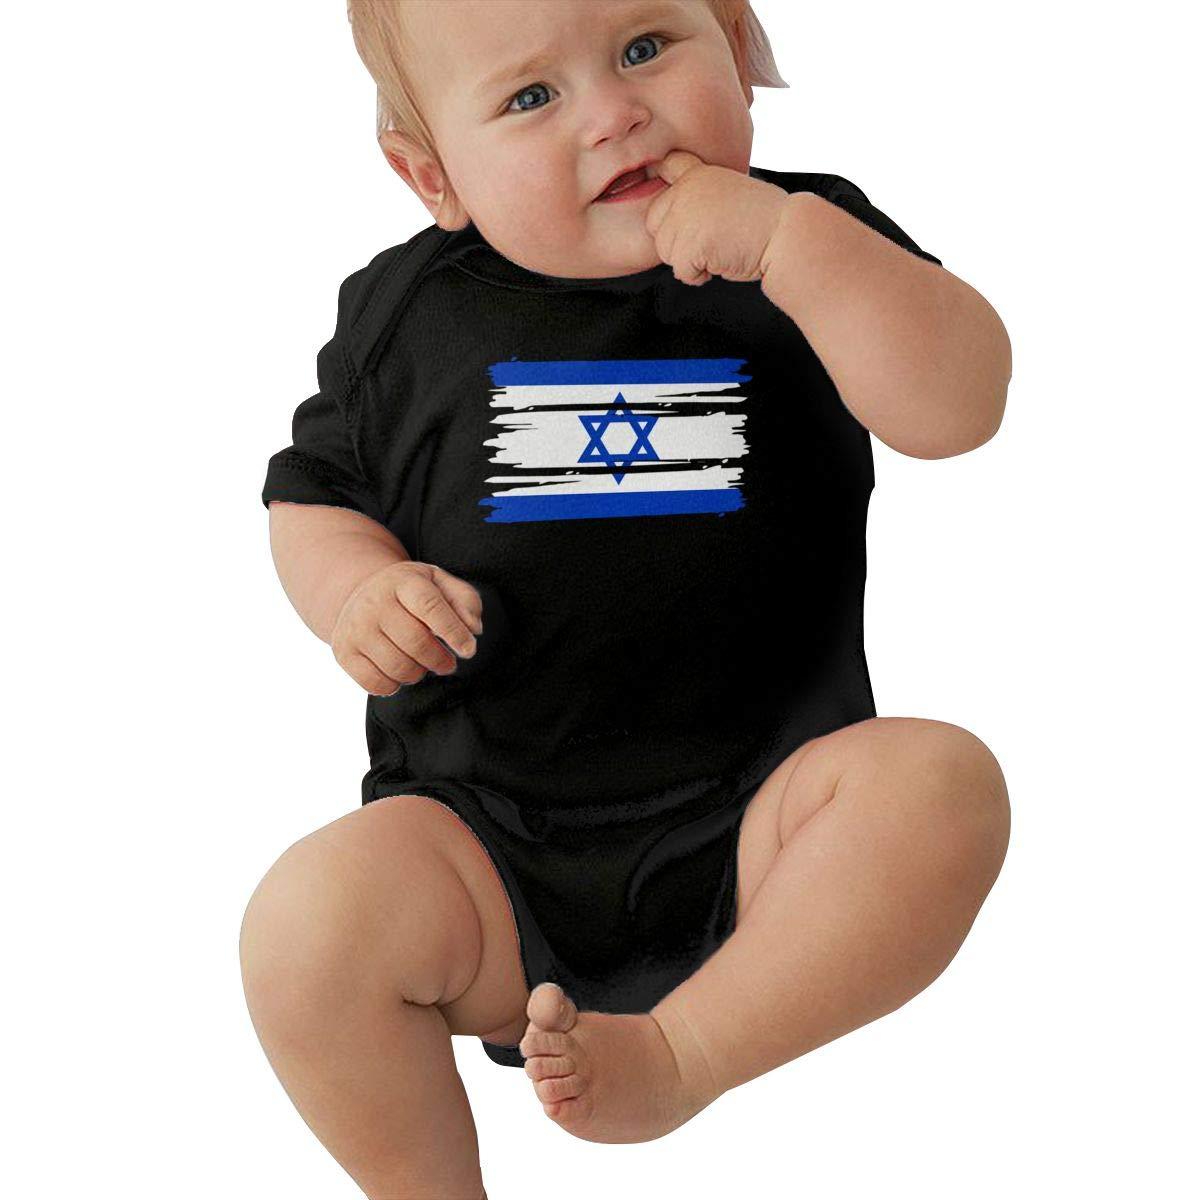 TAOHJS97 Newborn Israel Flag Short Sleeve Climbing Clothes Playsuit Suit 6-24 Months